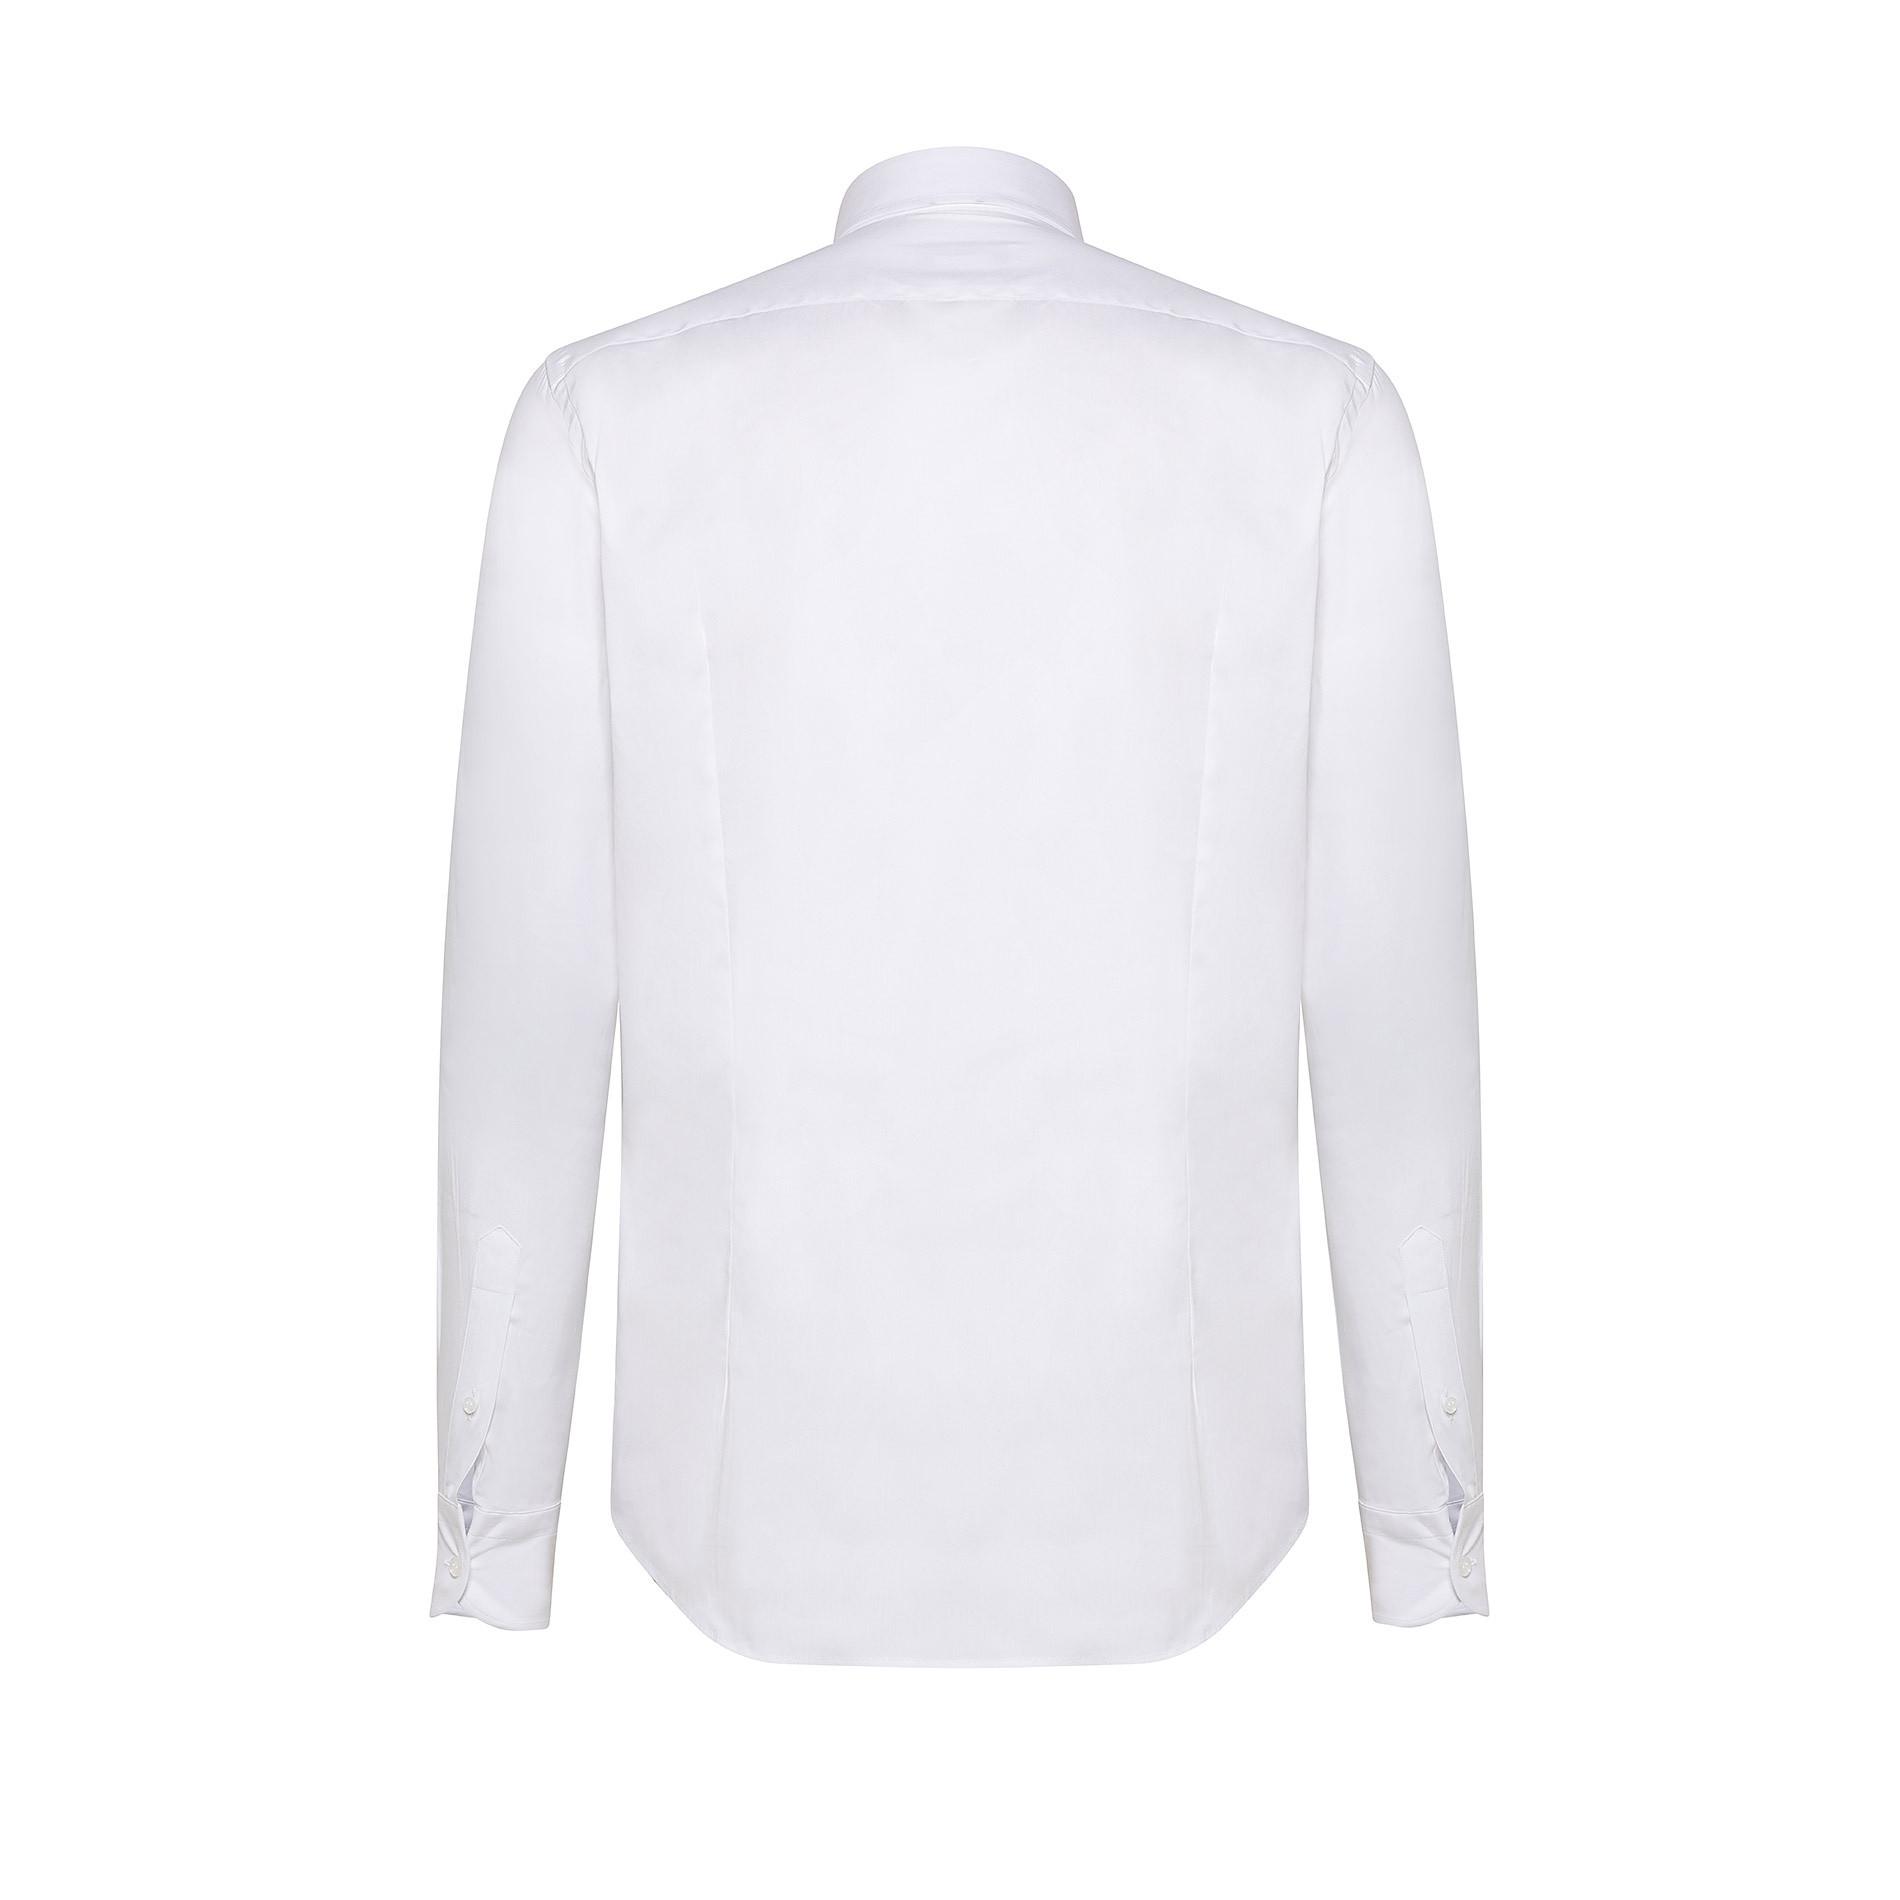 Camicia button-down popeline di cotone, Bianco, large image number 1